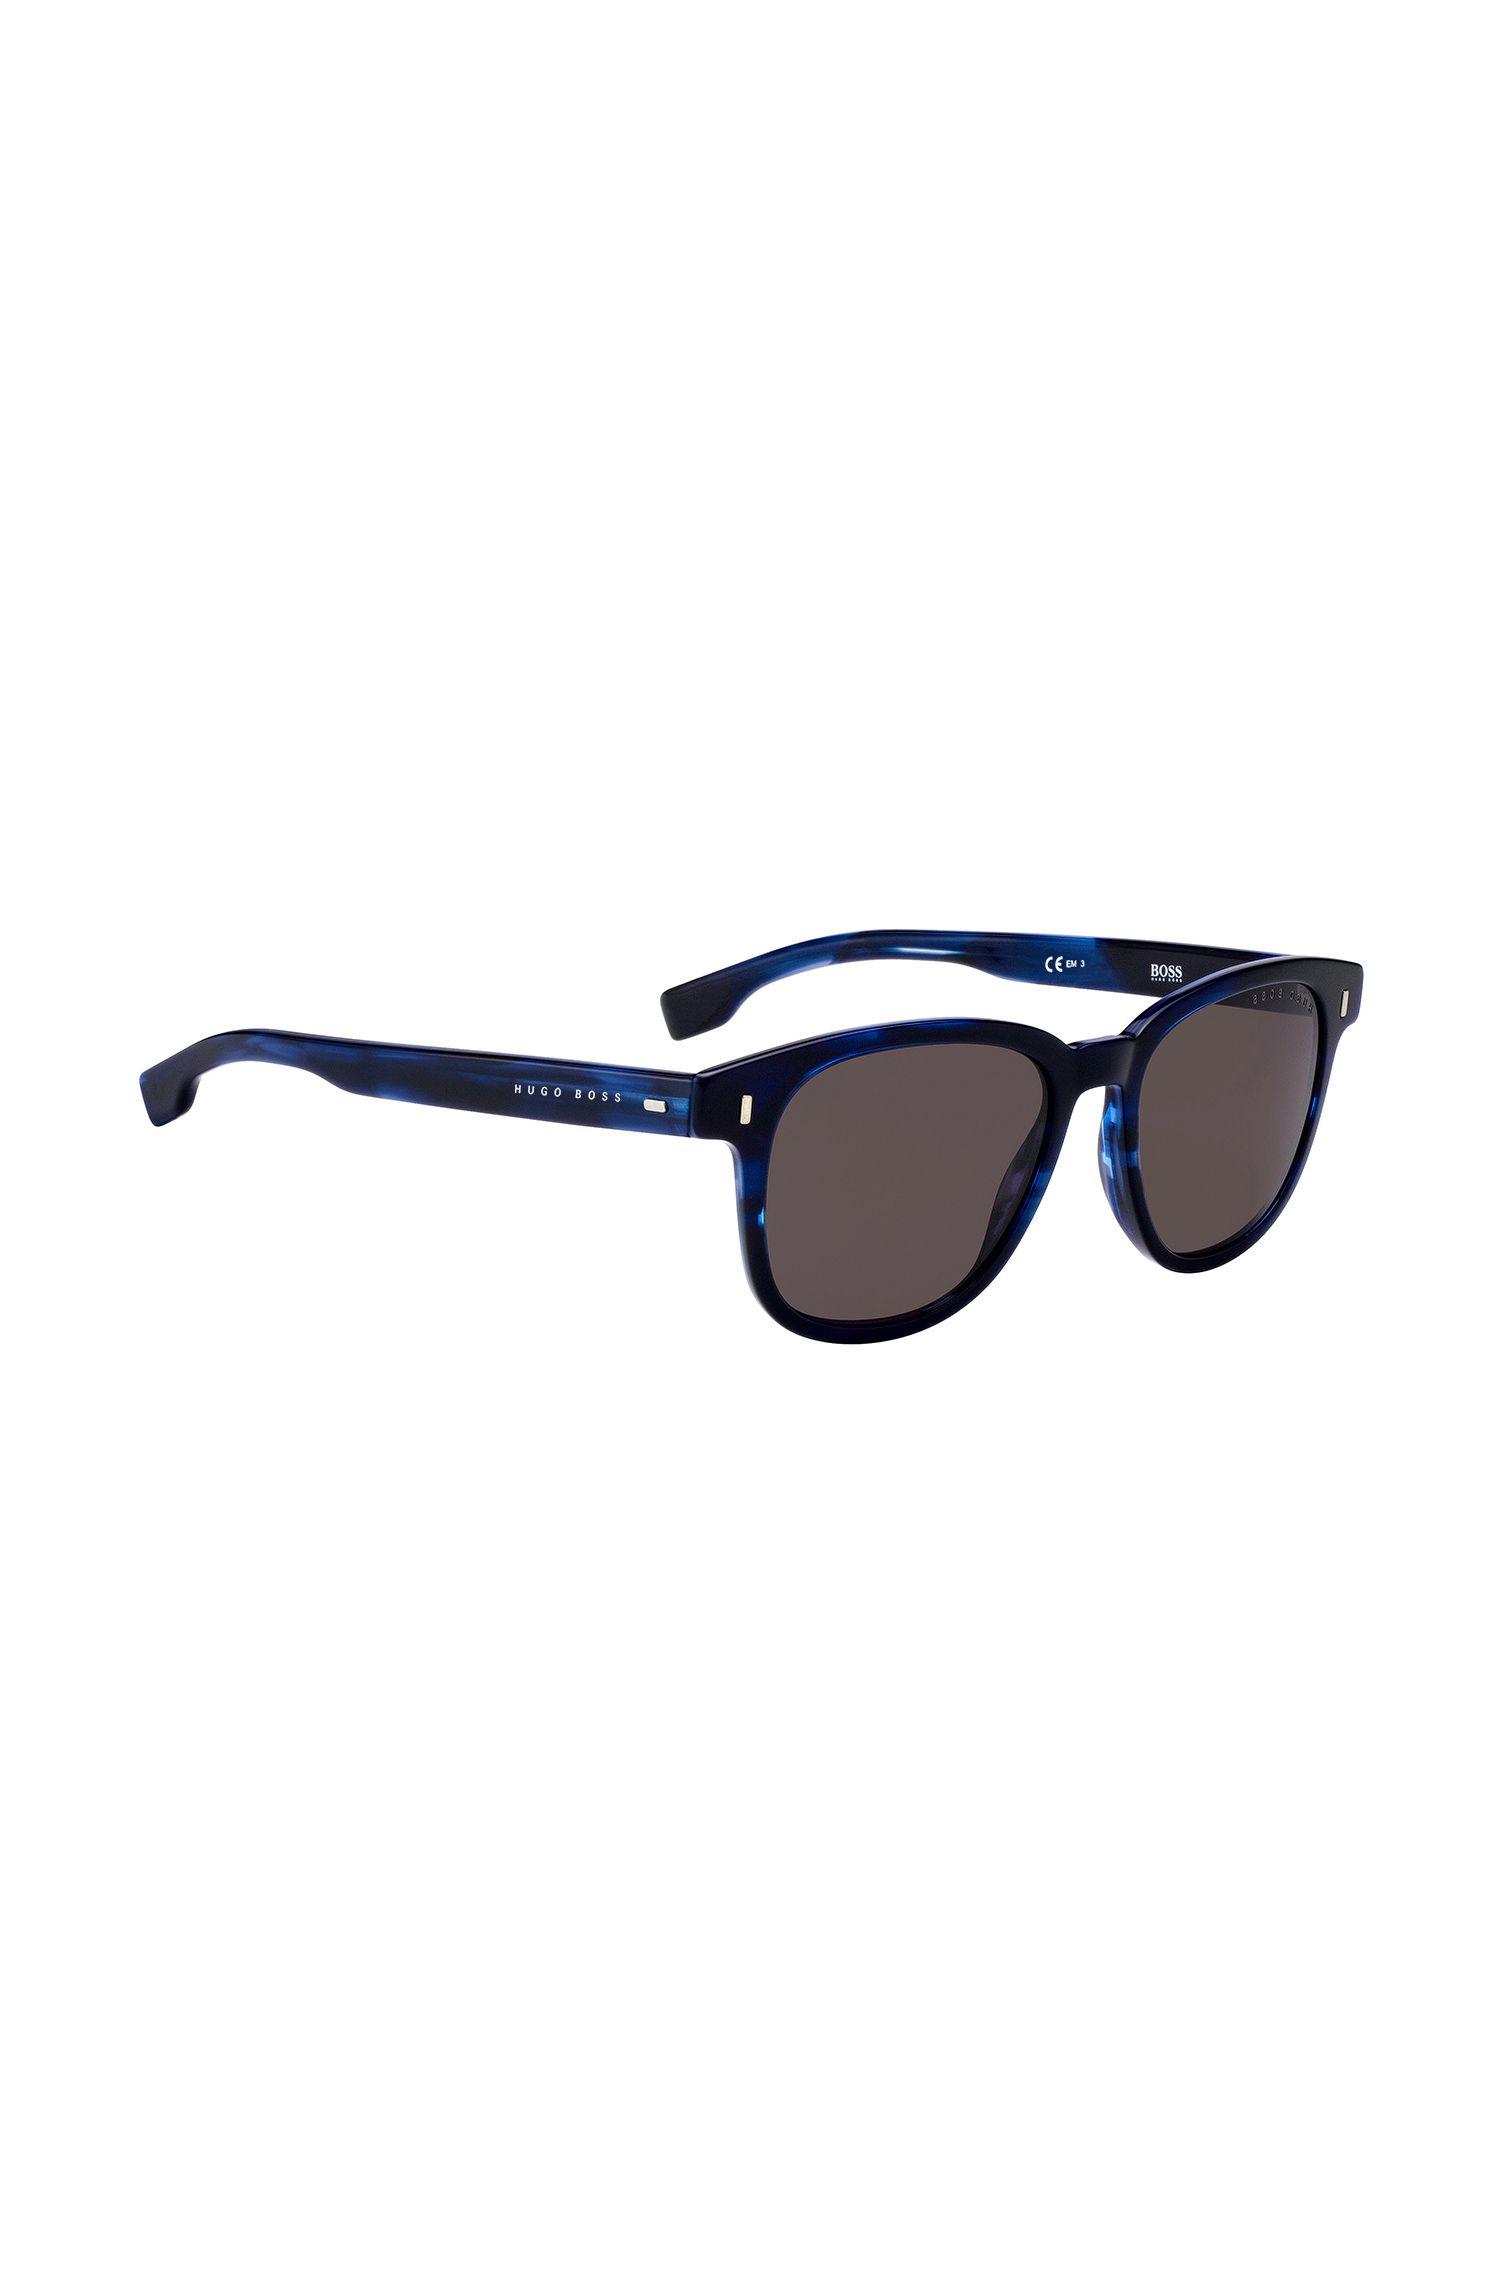 Sunglasses in blue-tinted Havana-pattern acetate